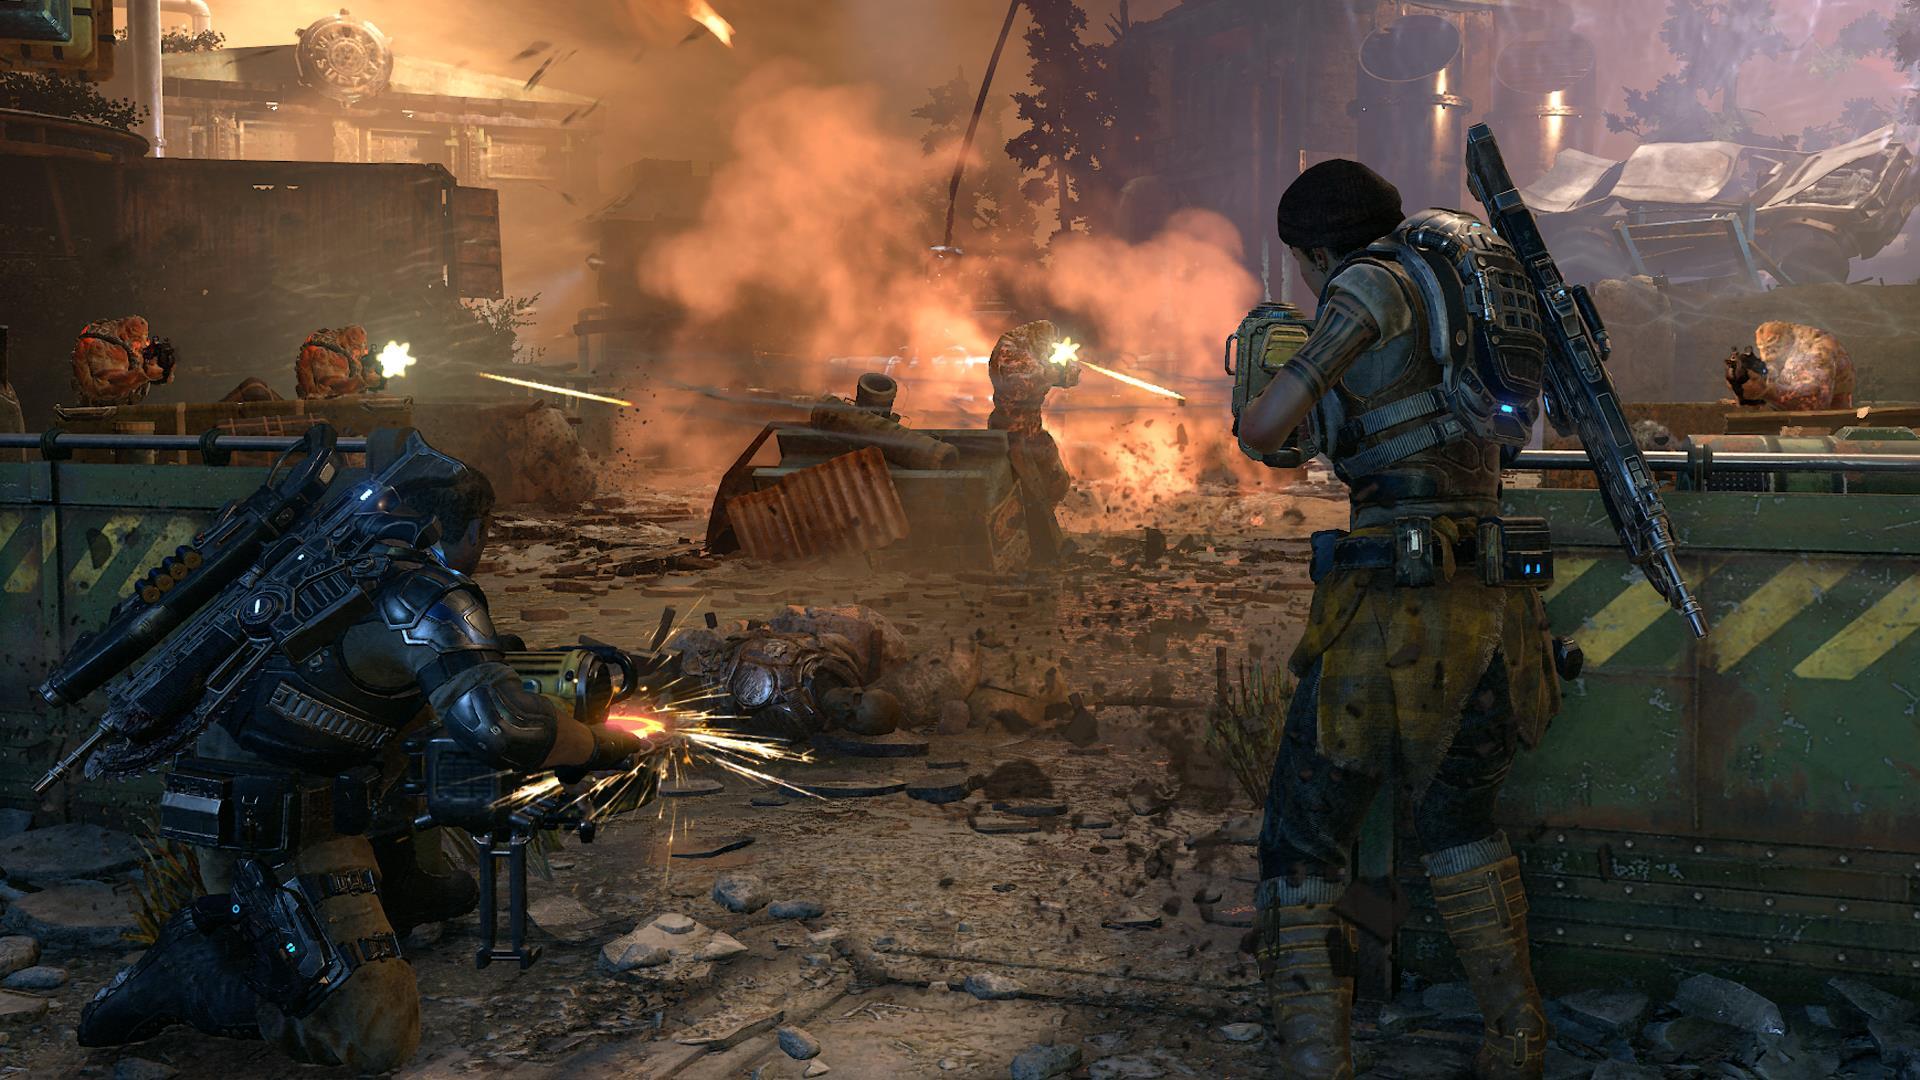 gears of war 4 насыщенные деталями бои